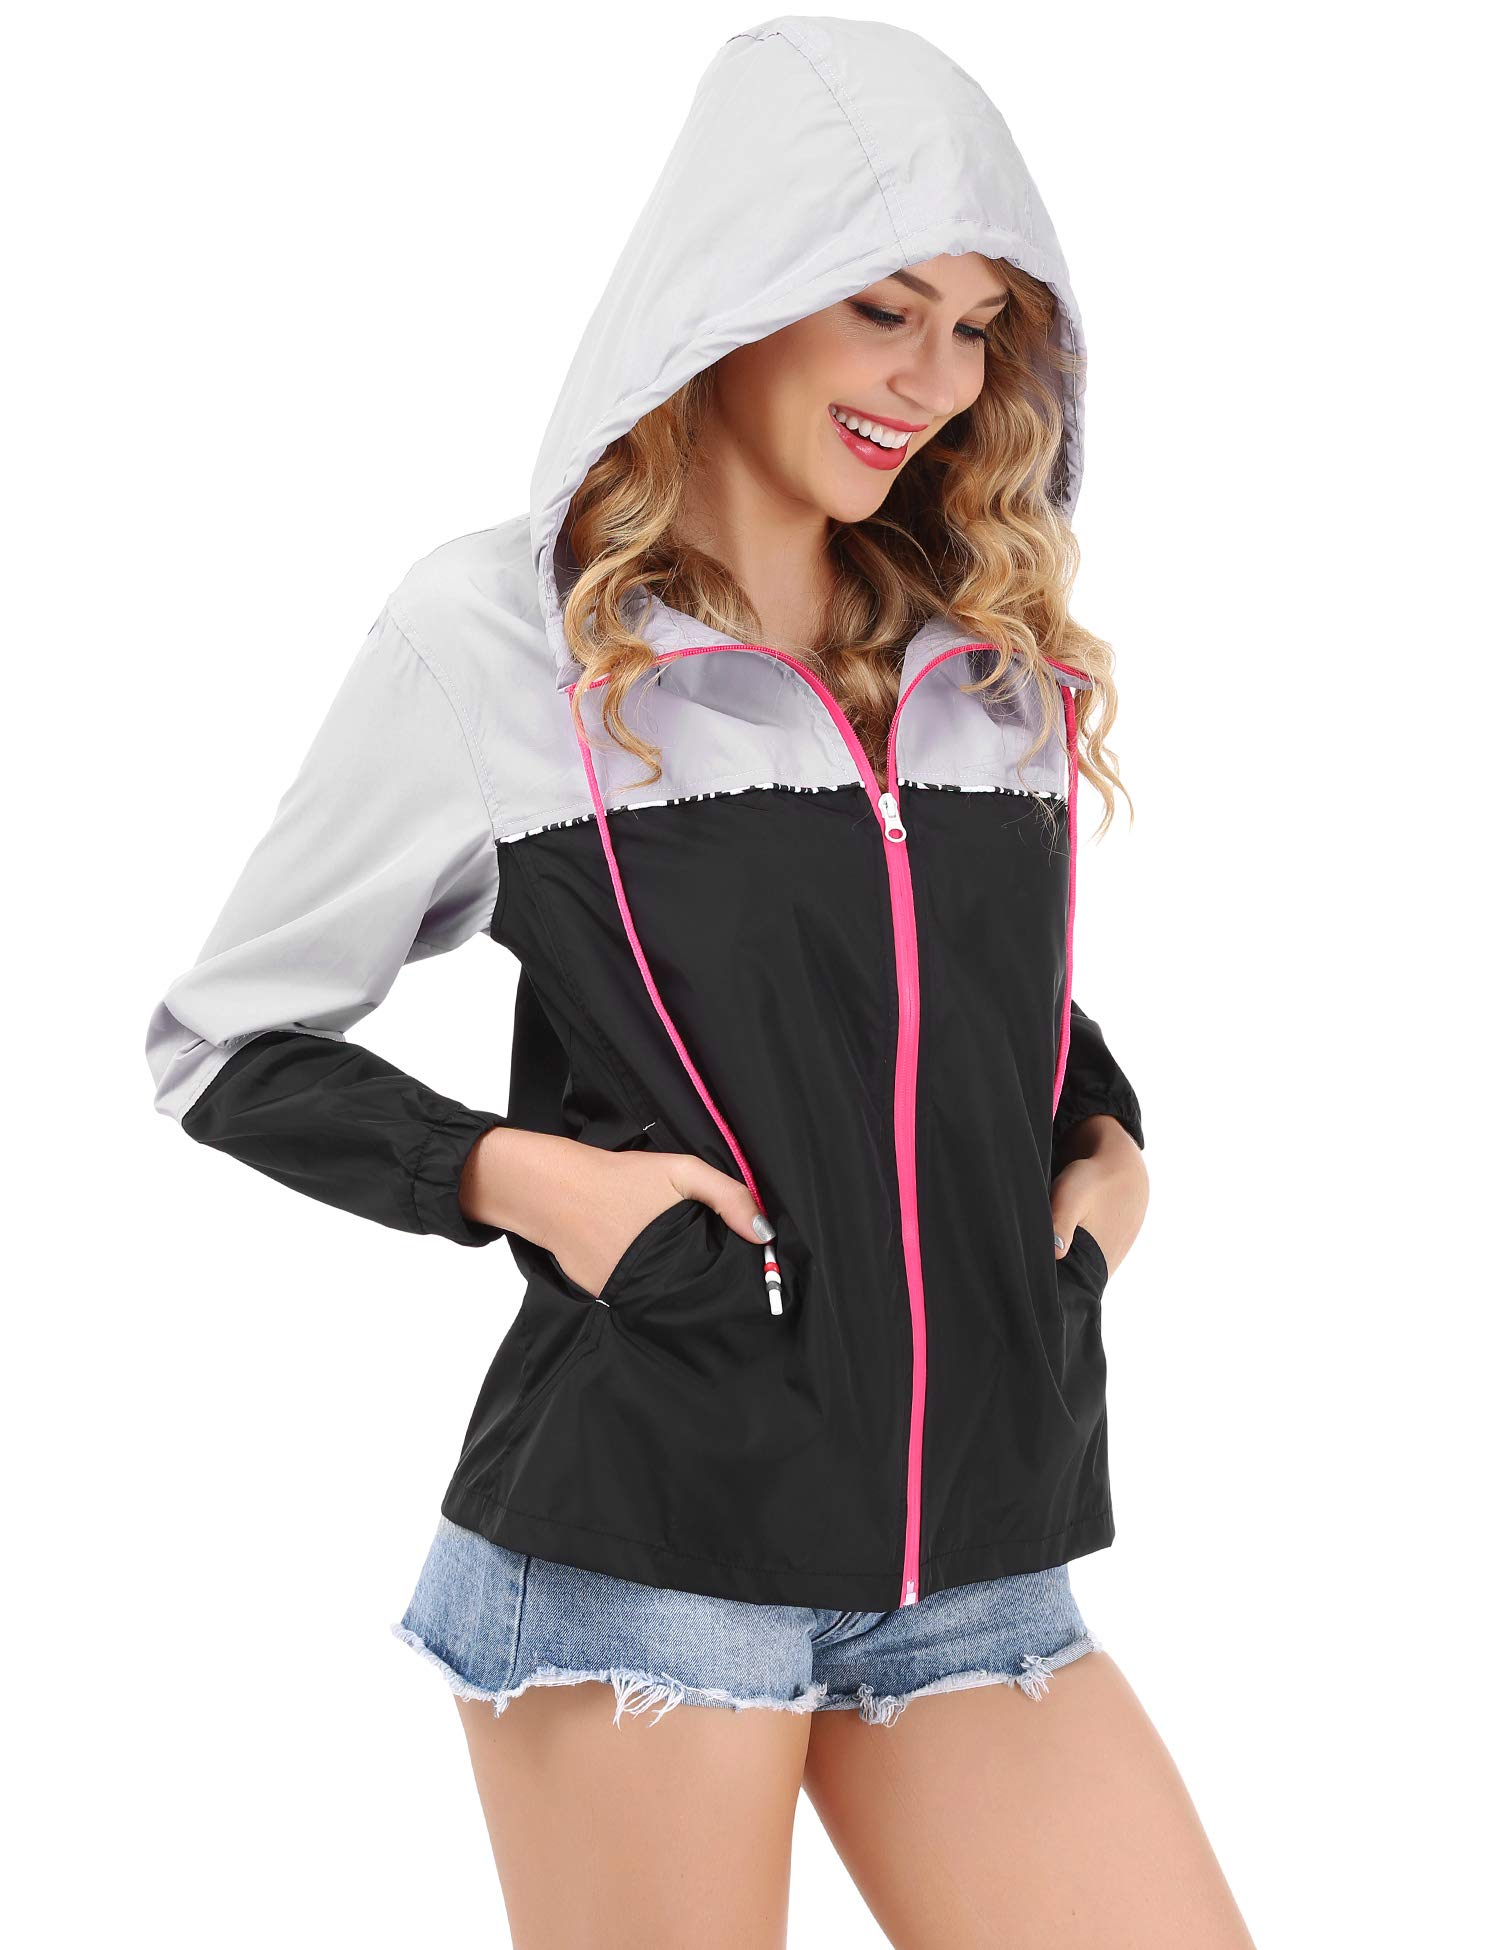 FISOUL Women's Waterproof Raincoat Packable Active Outdoor Hooded Lightweight Rain Jacket Windbreaker S-XXL(Gray/Black,Medium)